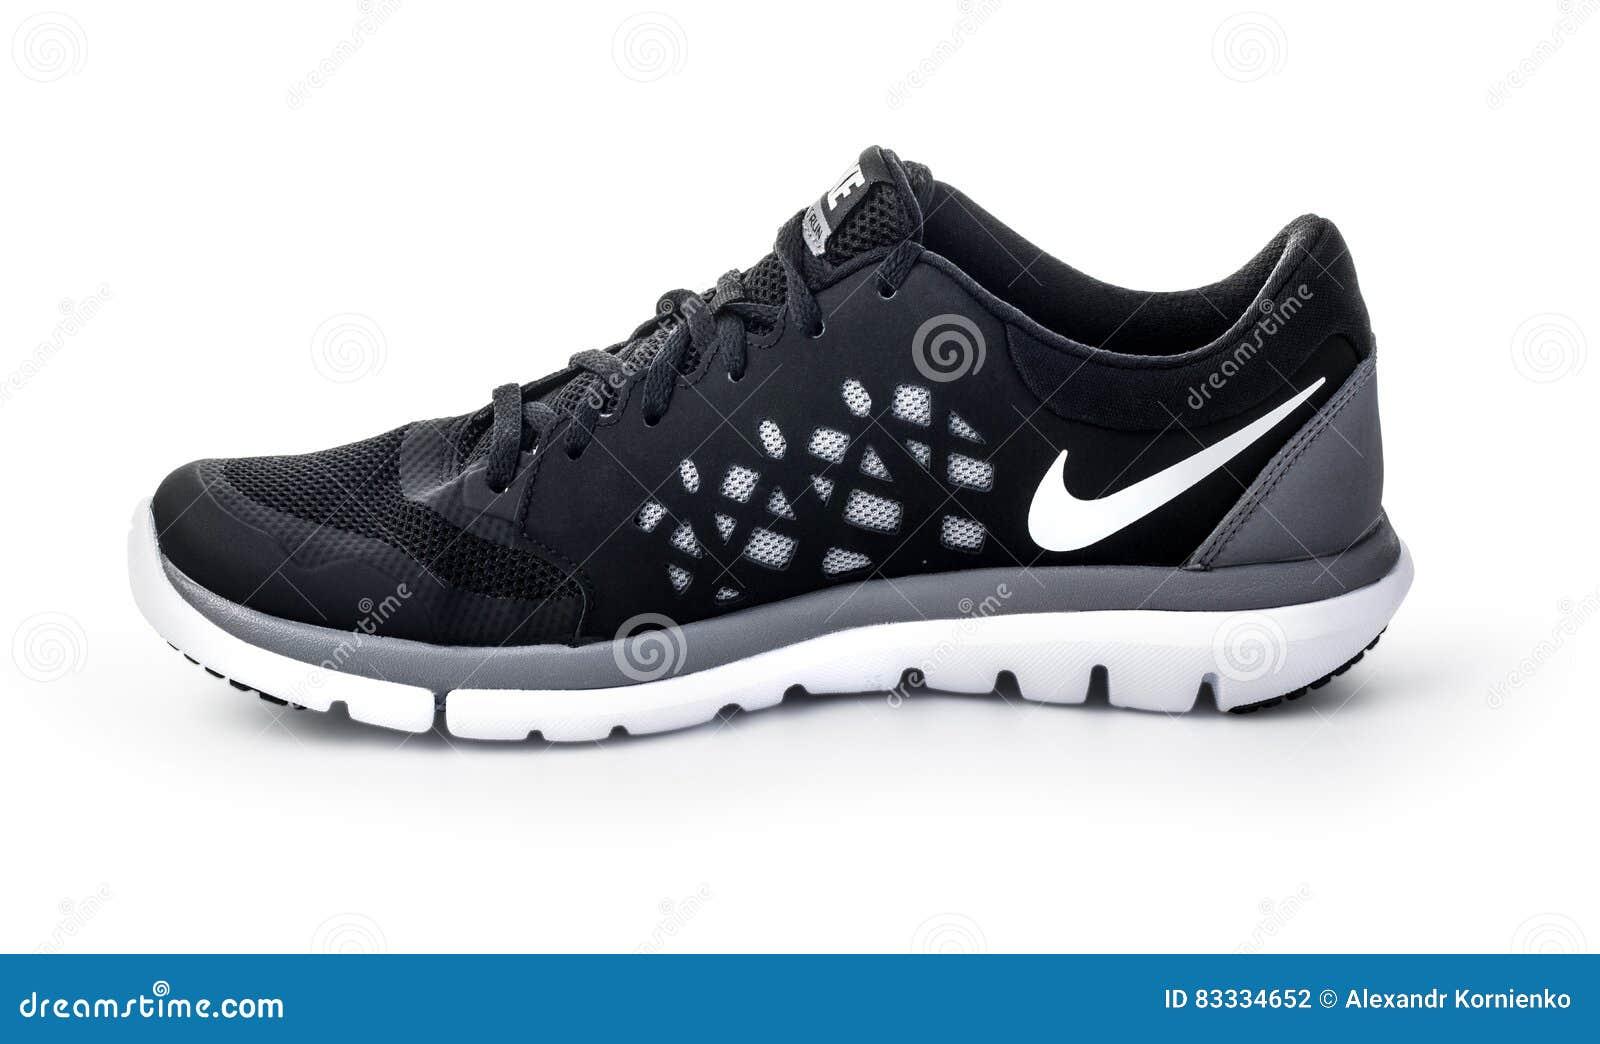 sale retailer f9fec df6f5 New style nike shoes.